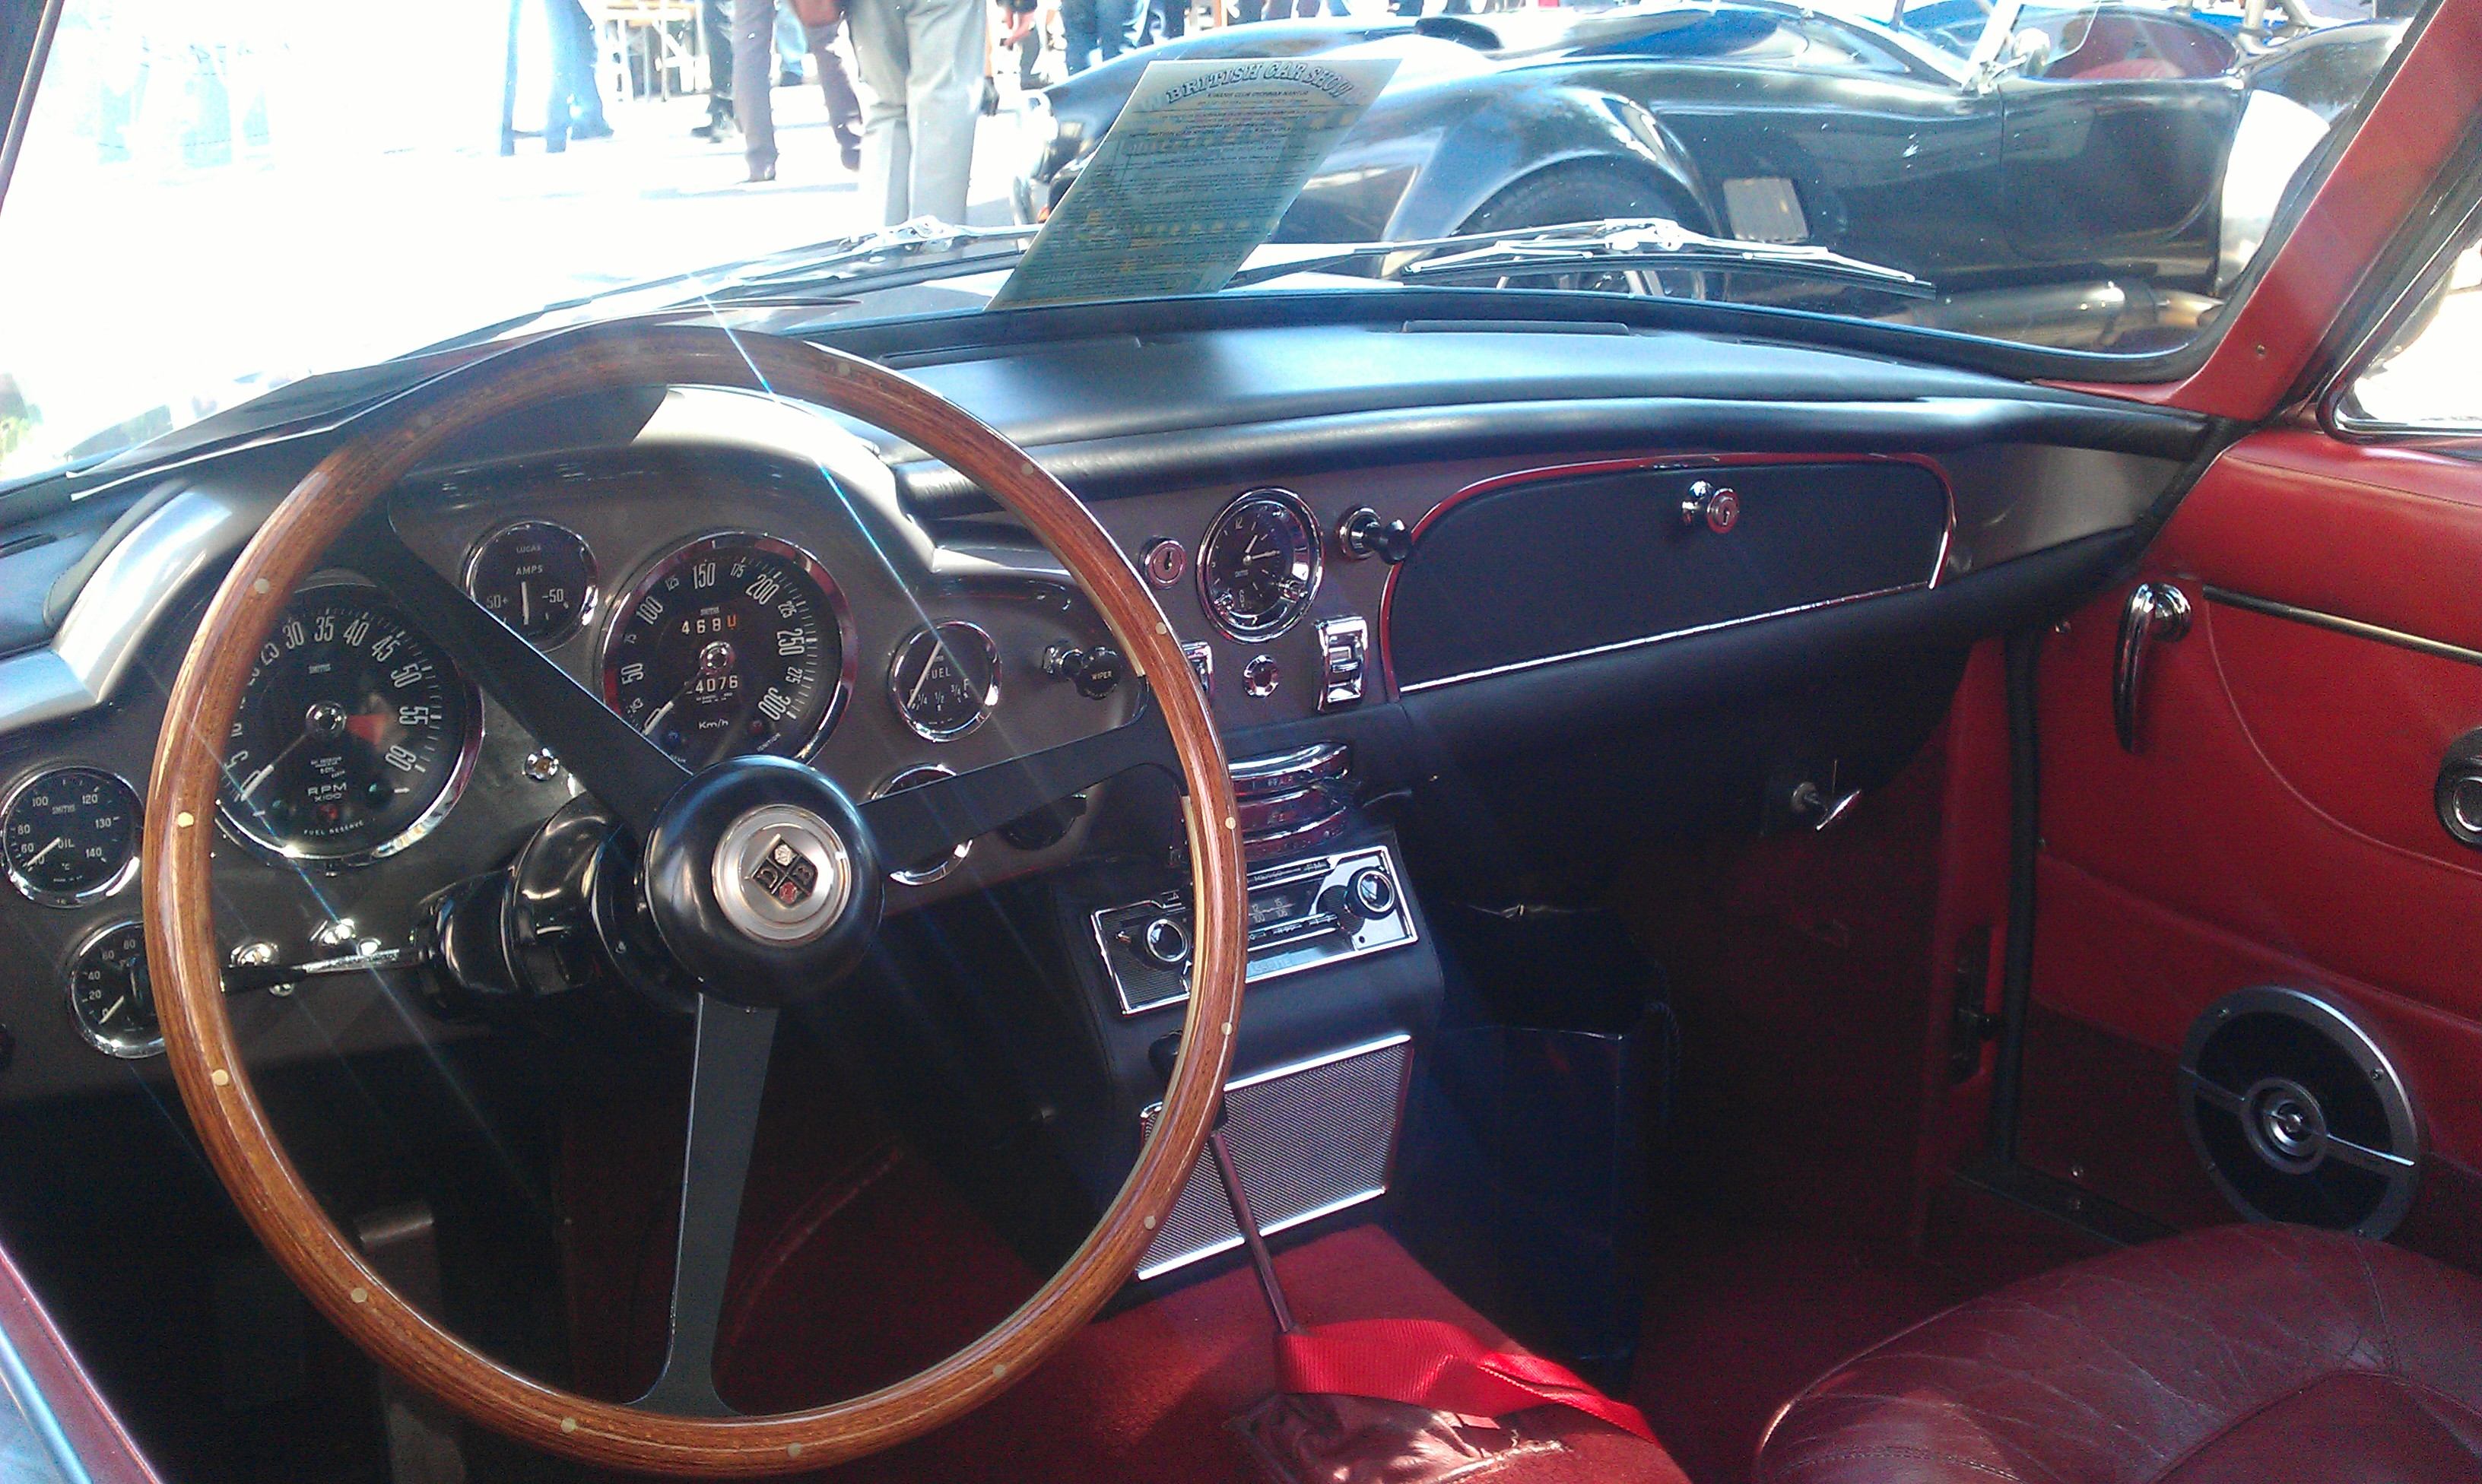 FileAston Martin DB6 Vantage in Morges Interior